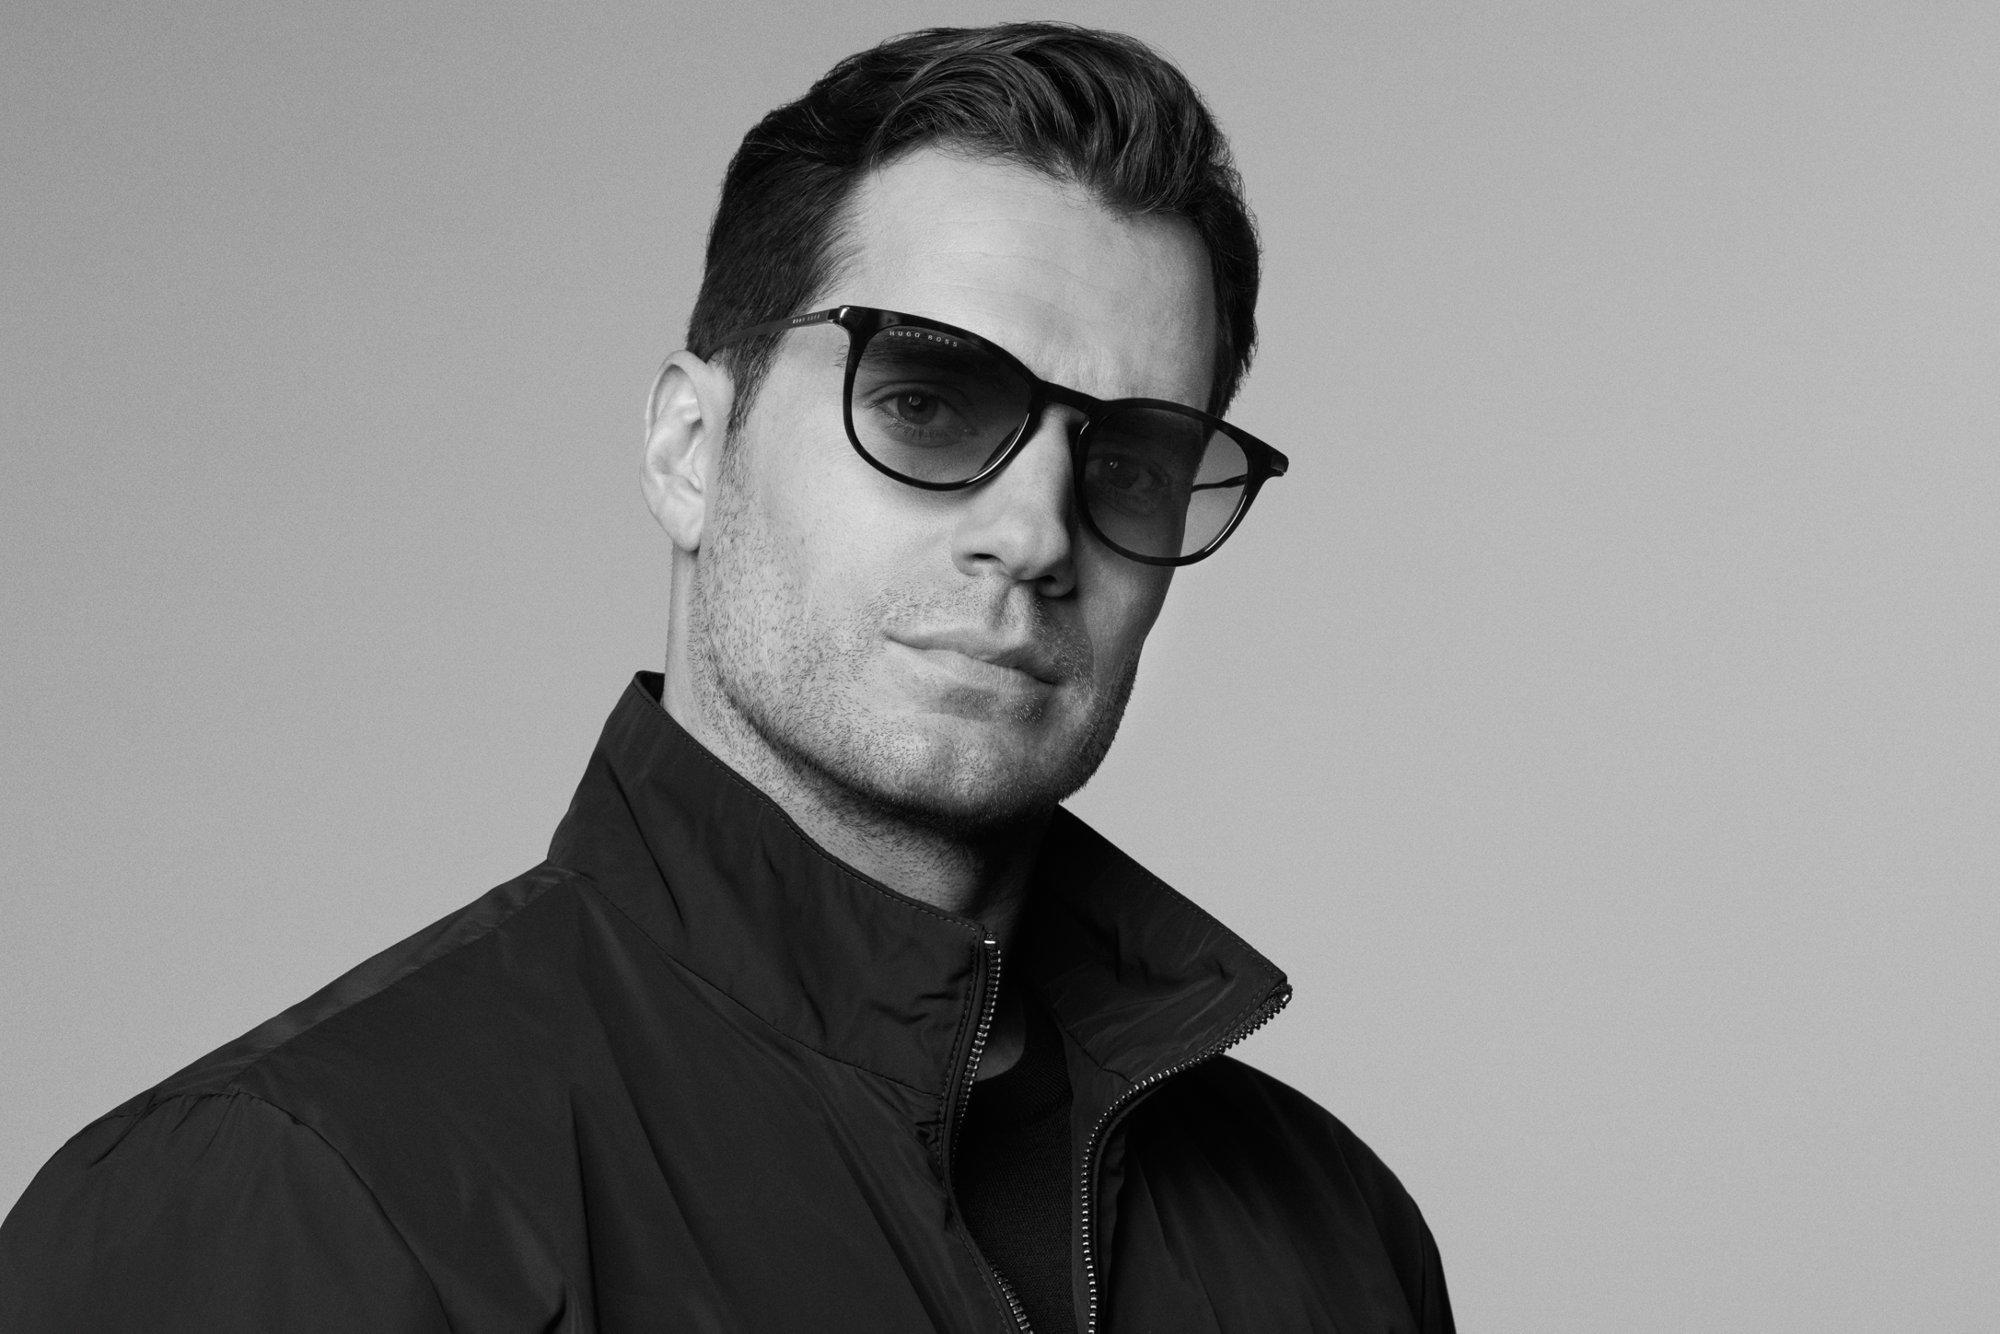 BOSS 眼镜新品系列